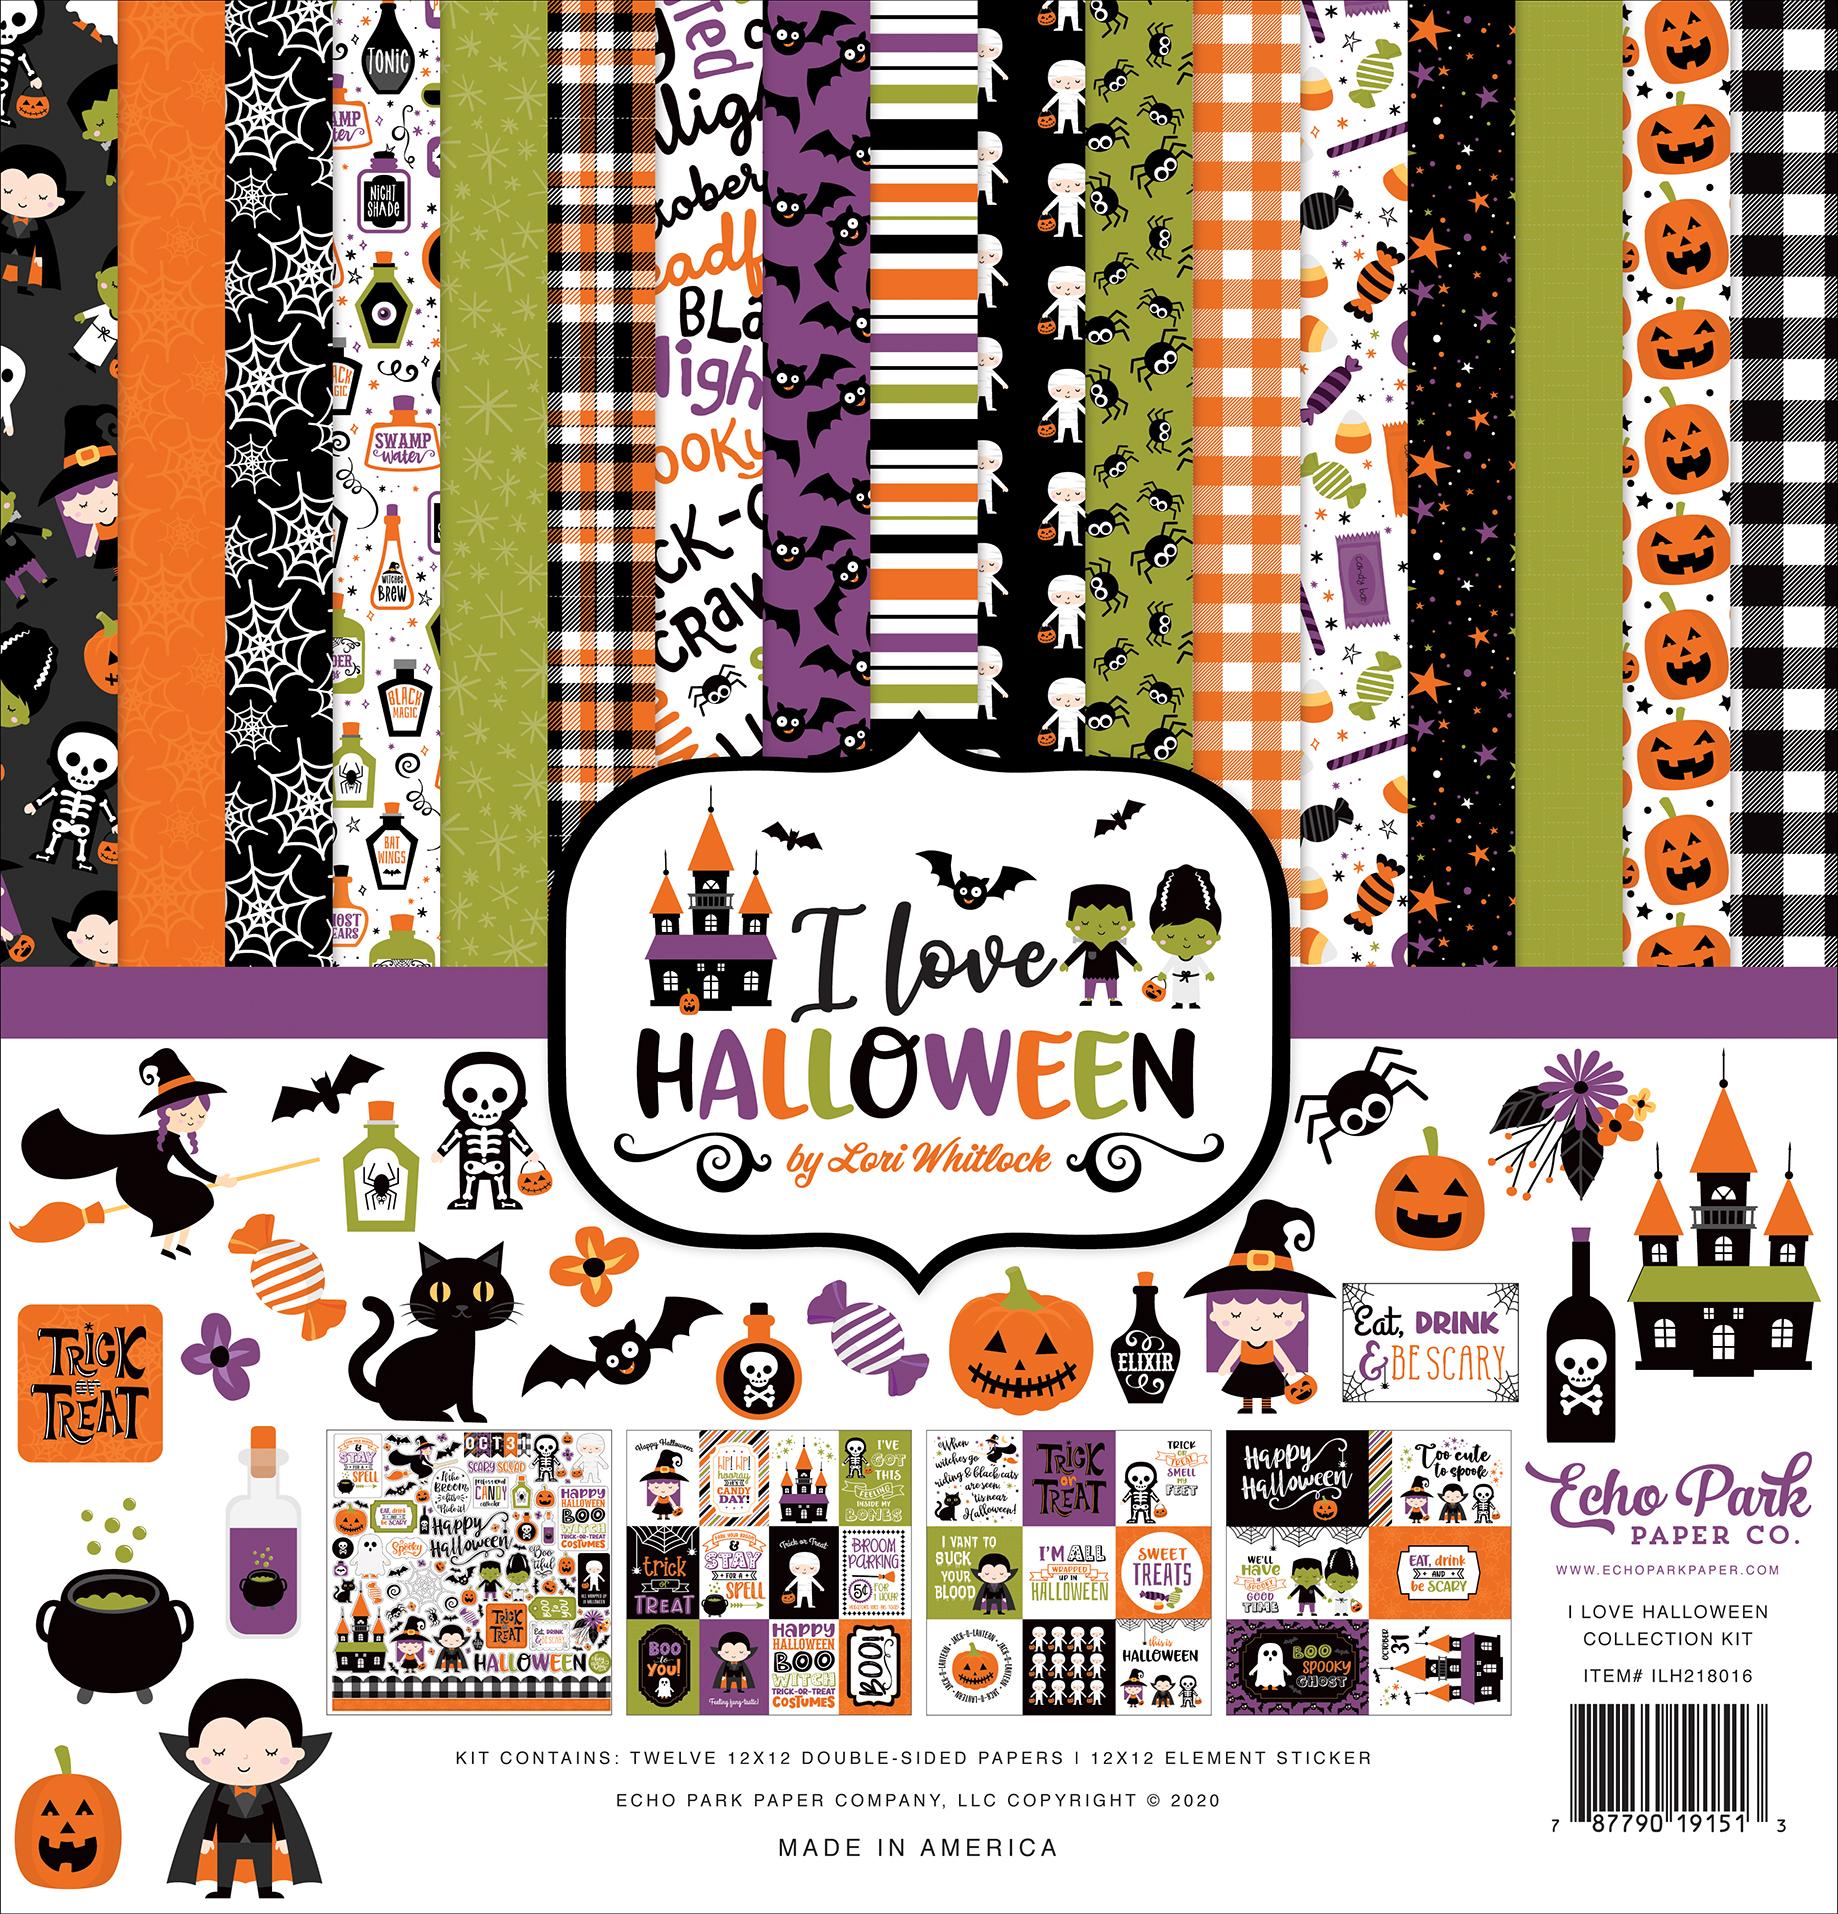 I Love Halloween Collection Kit